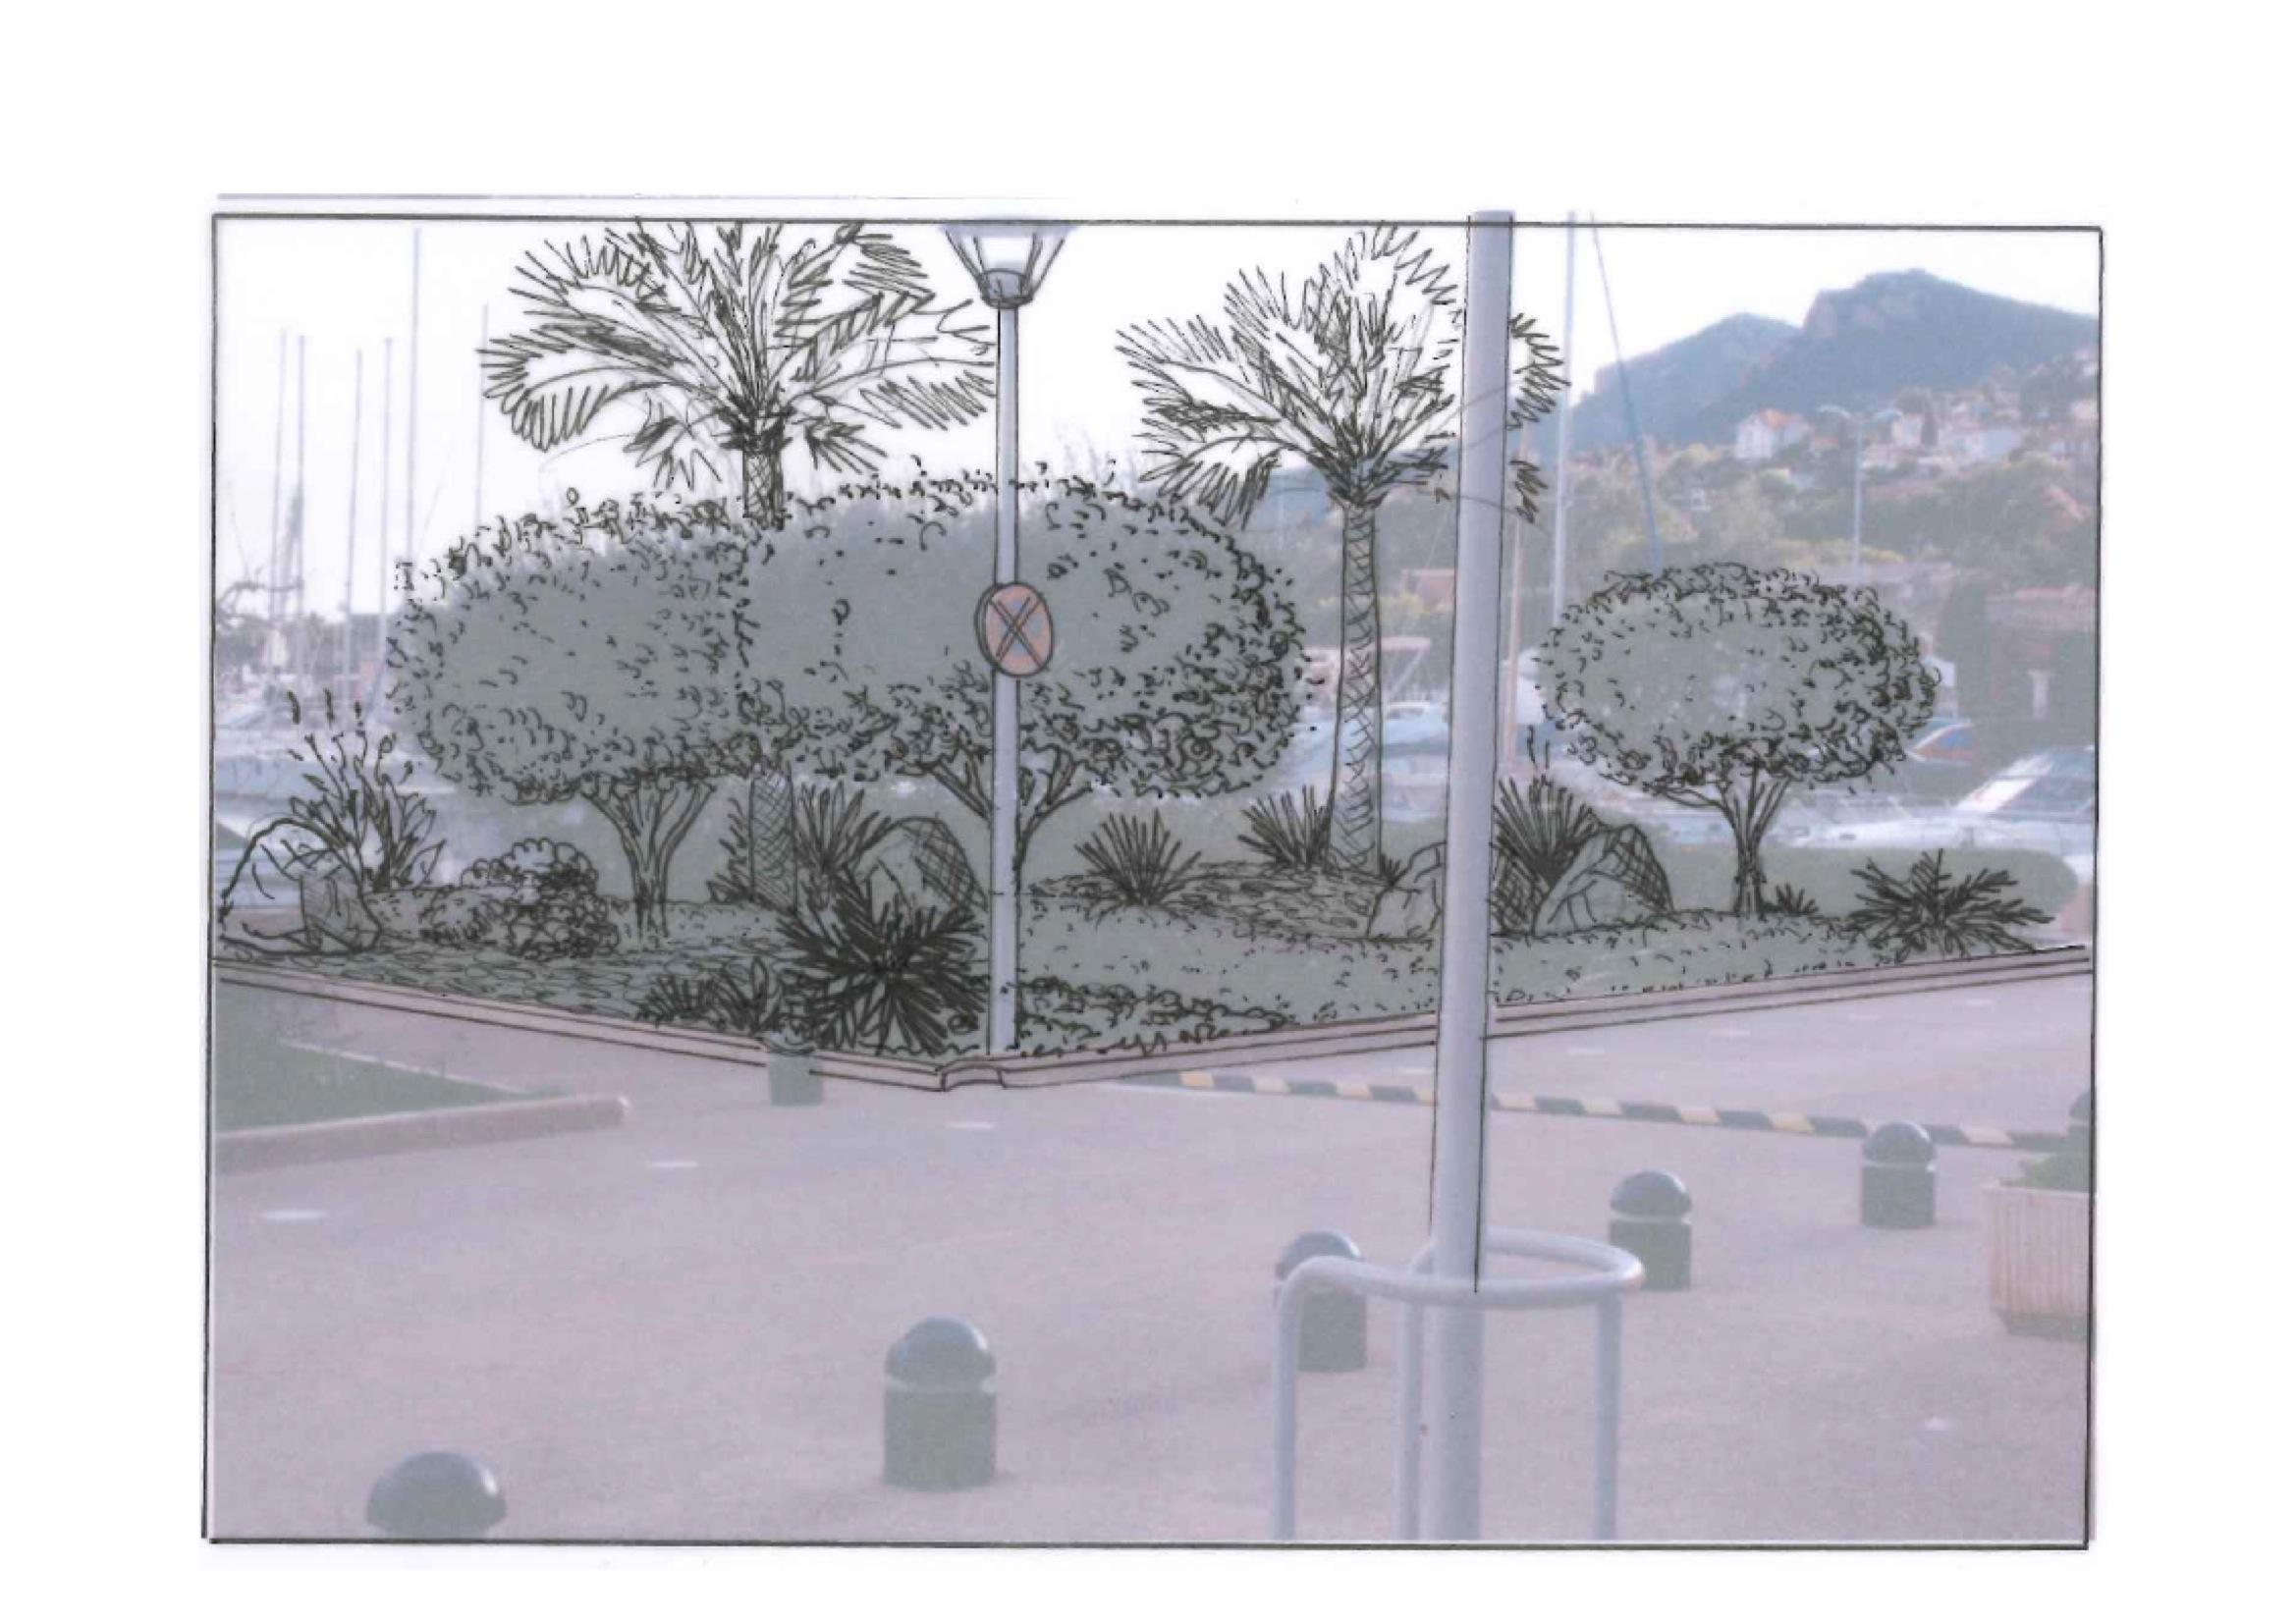 Etude paysag re entretien jardin espaces verts cannes for Entretien jardin 93